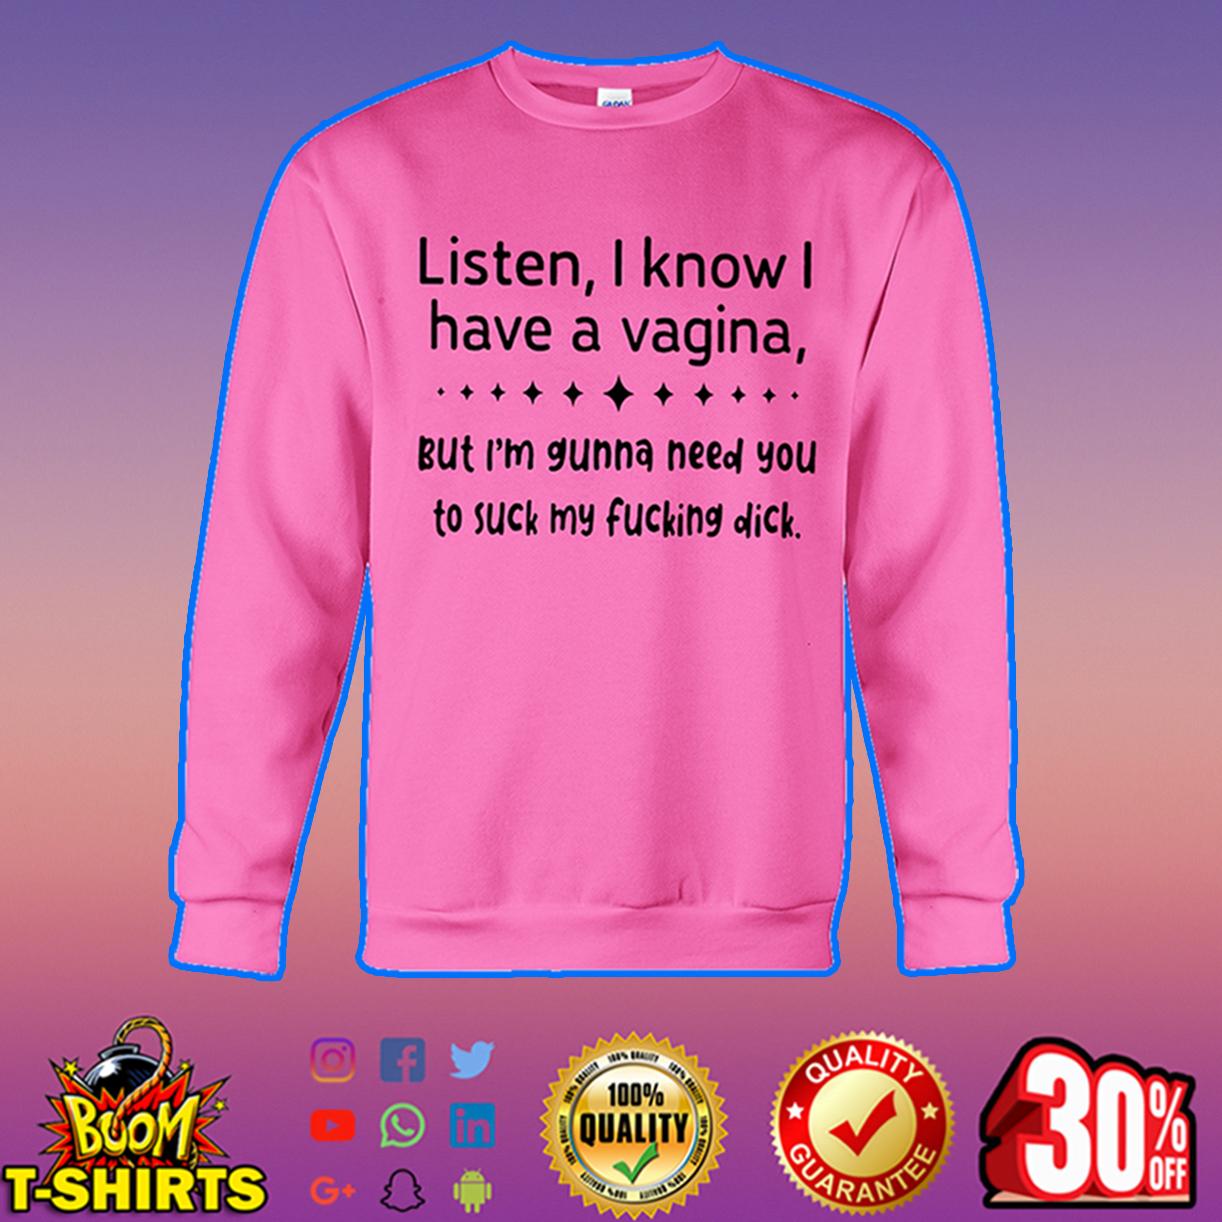 Listen I know I have a vagina sweatshirt